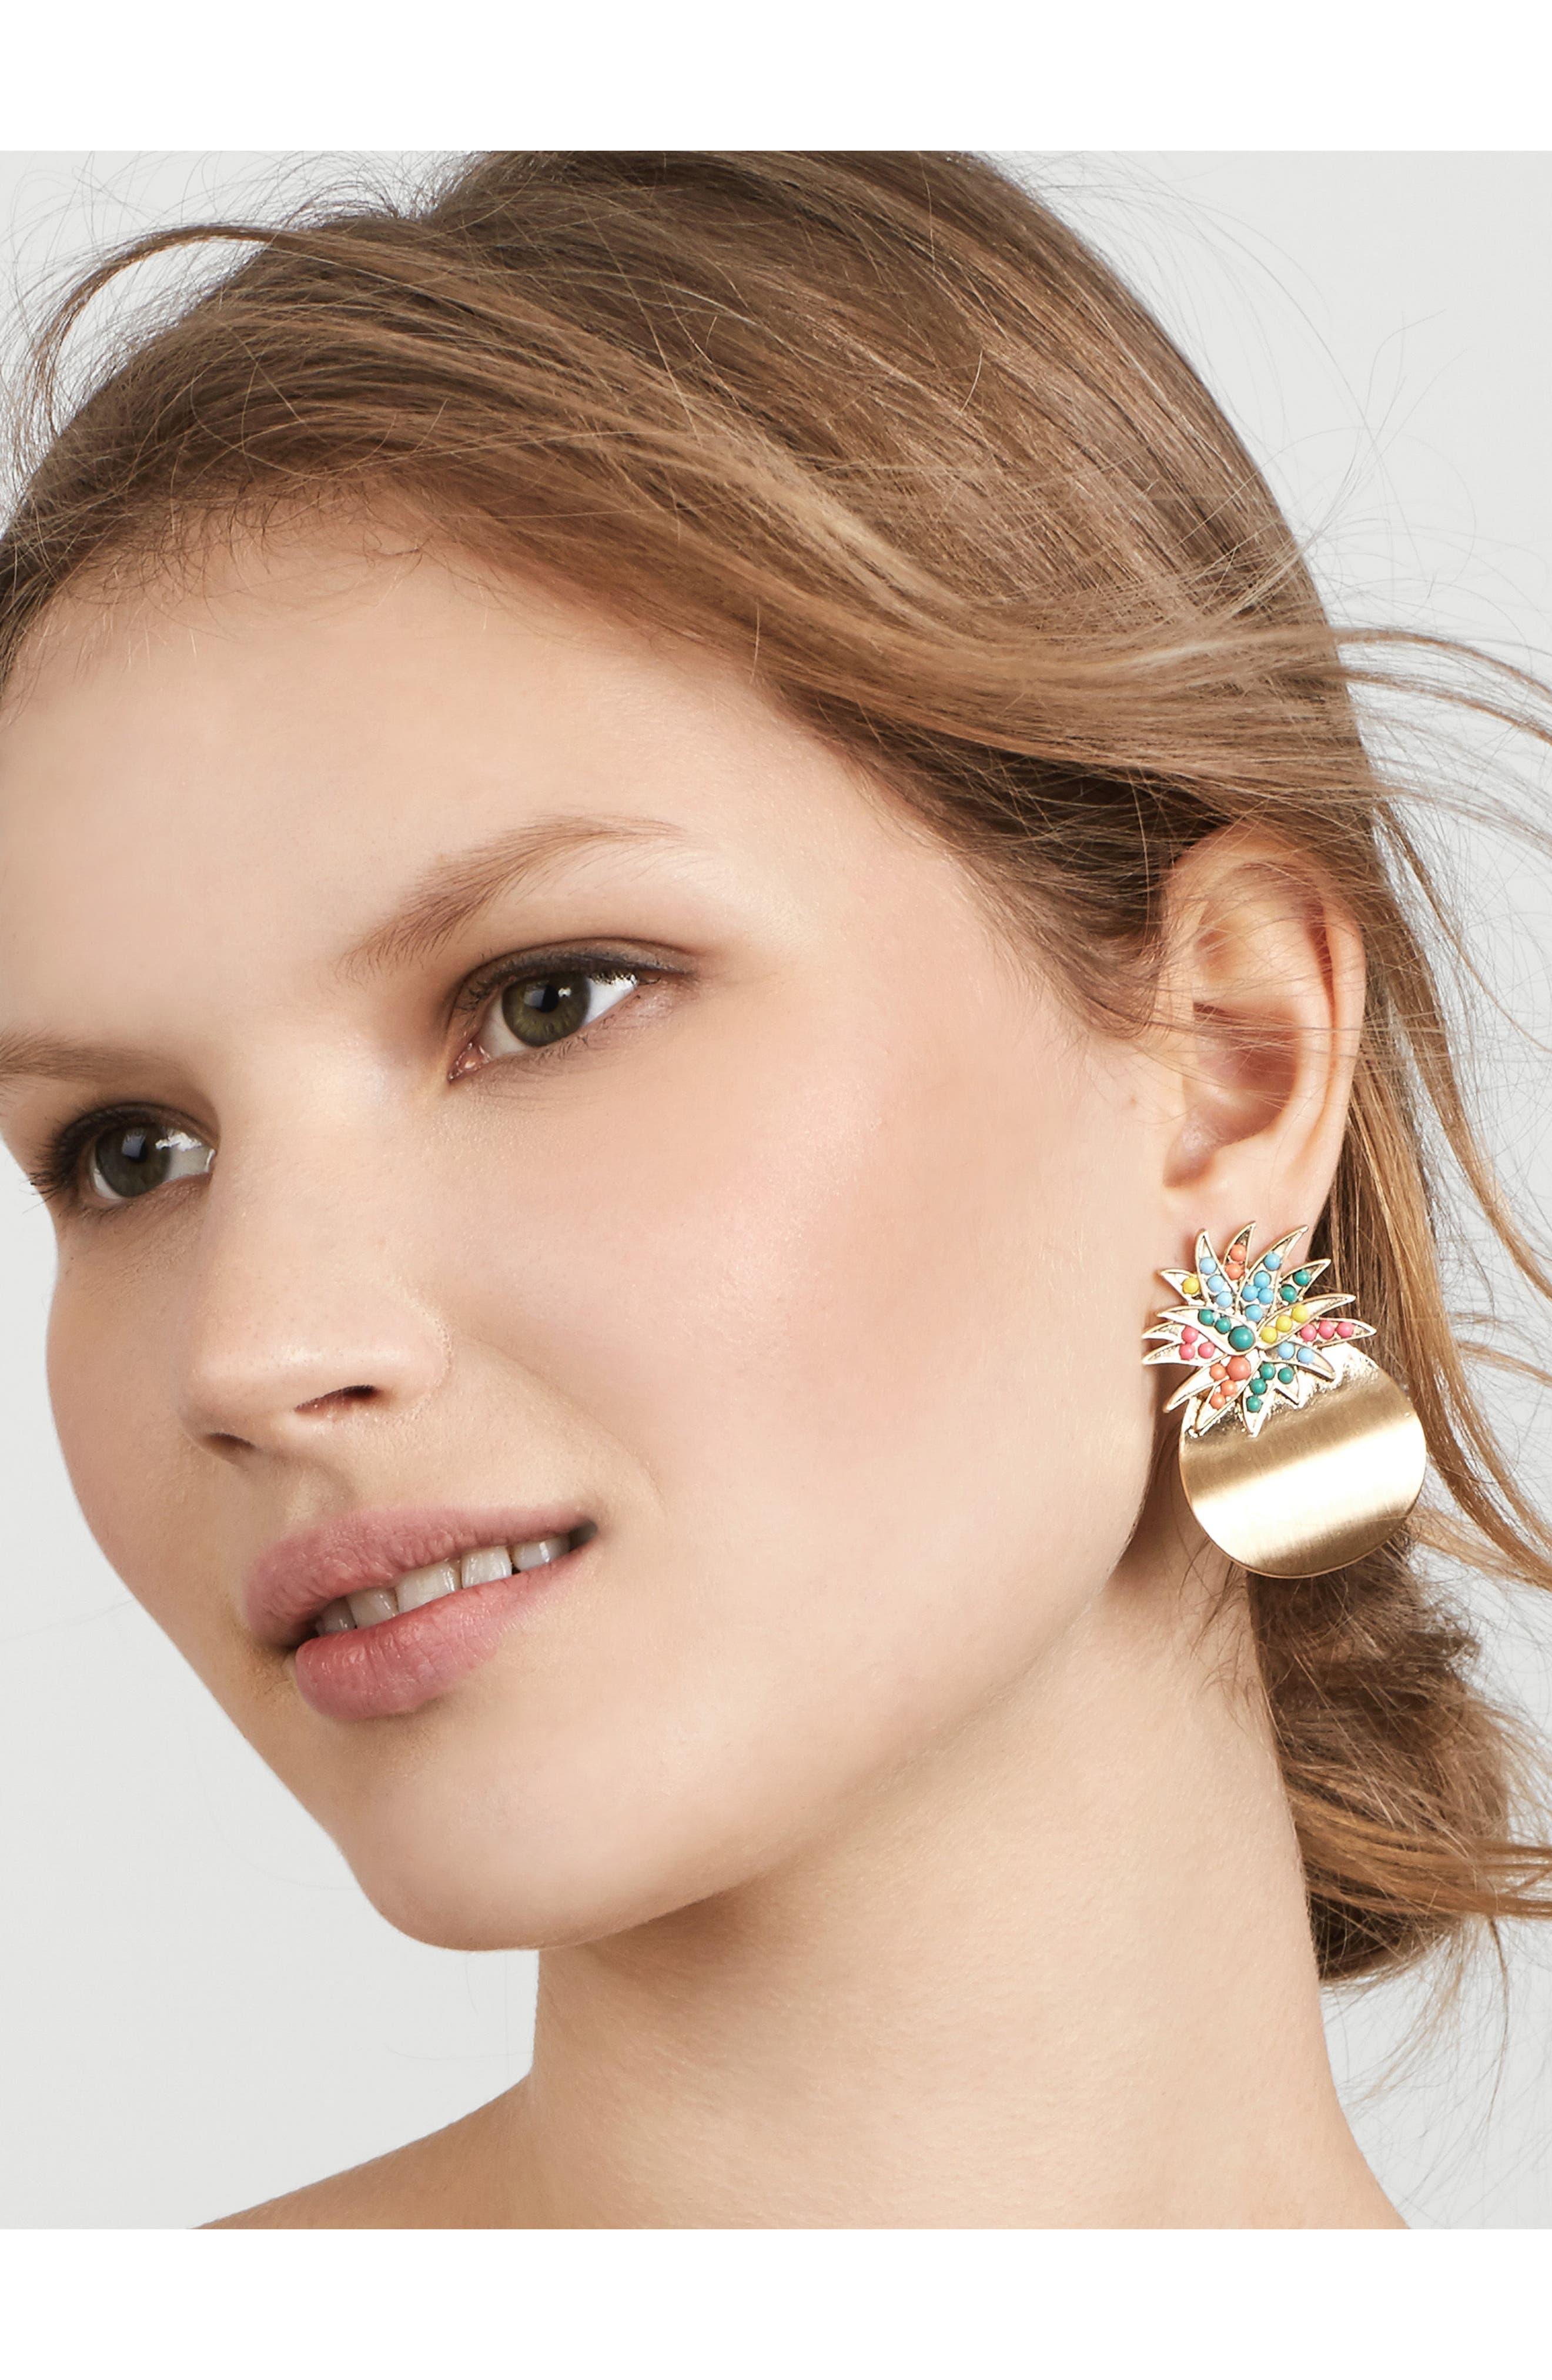 Mai Tai Stud Earrings,                             Alternate thumbnail 2, color,                             710